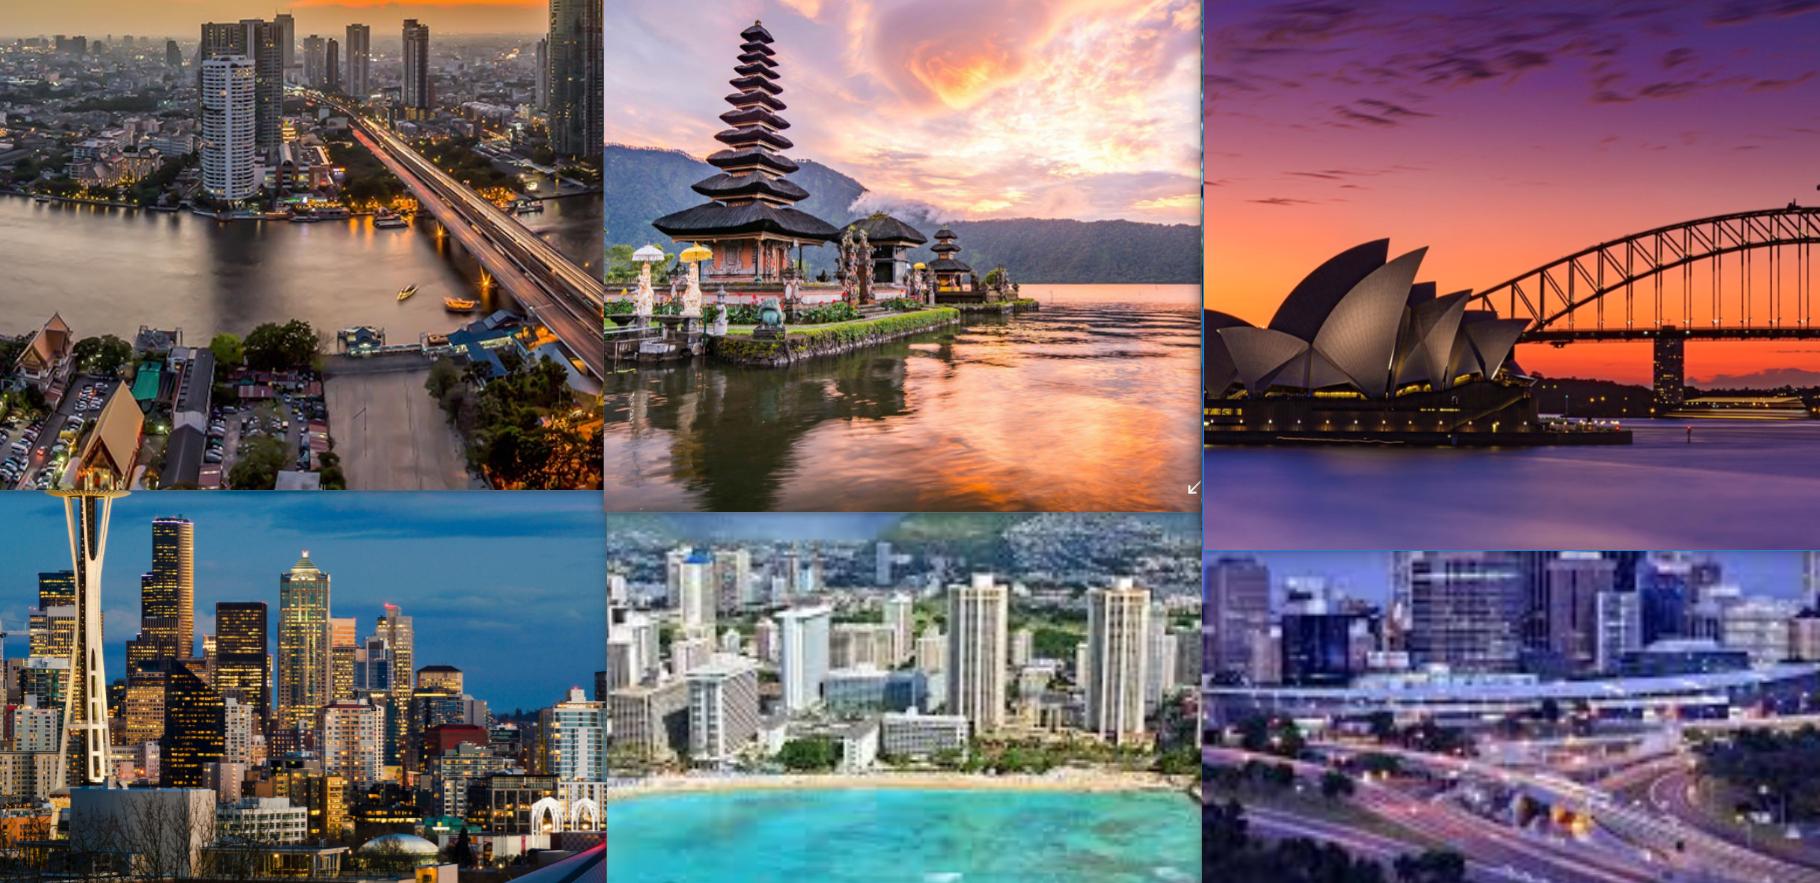 Singlereise Weltreise (6 Wochen) NUR Flüge Thailand, Japan, Bali, Australien, Neuseeland, Honolulu, USA